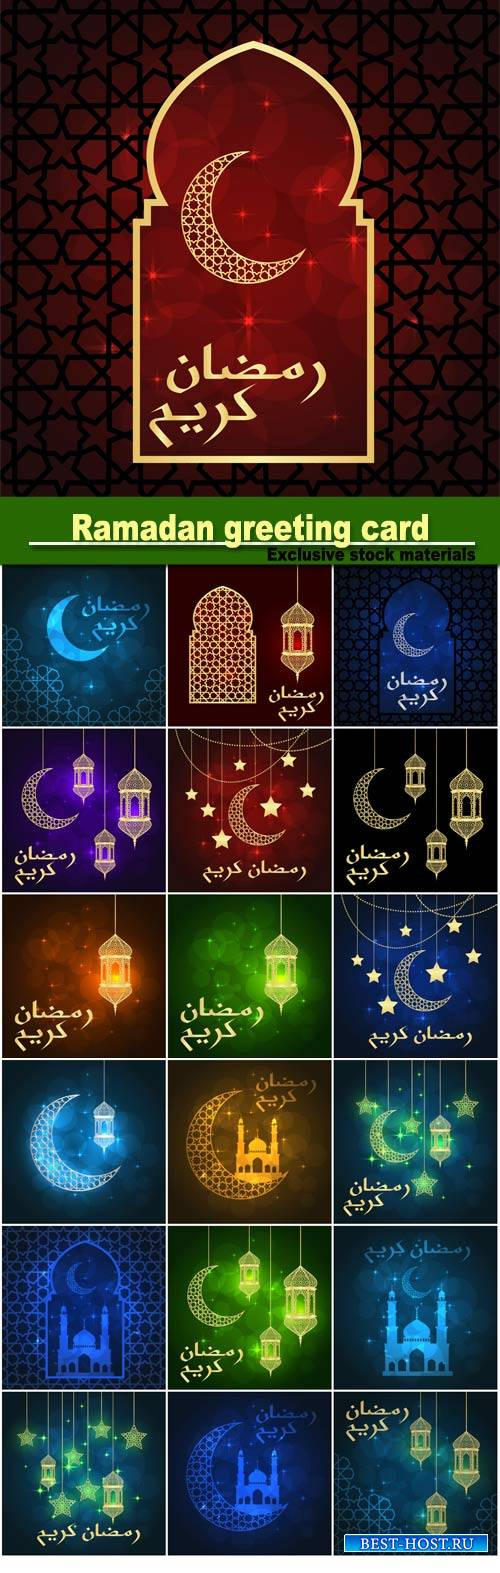 Ramadan greeting card, vector backgrounds